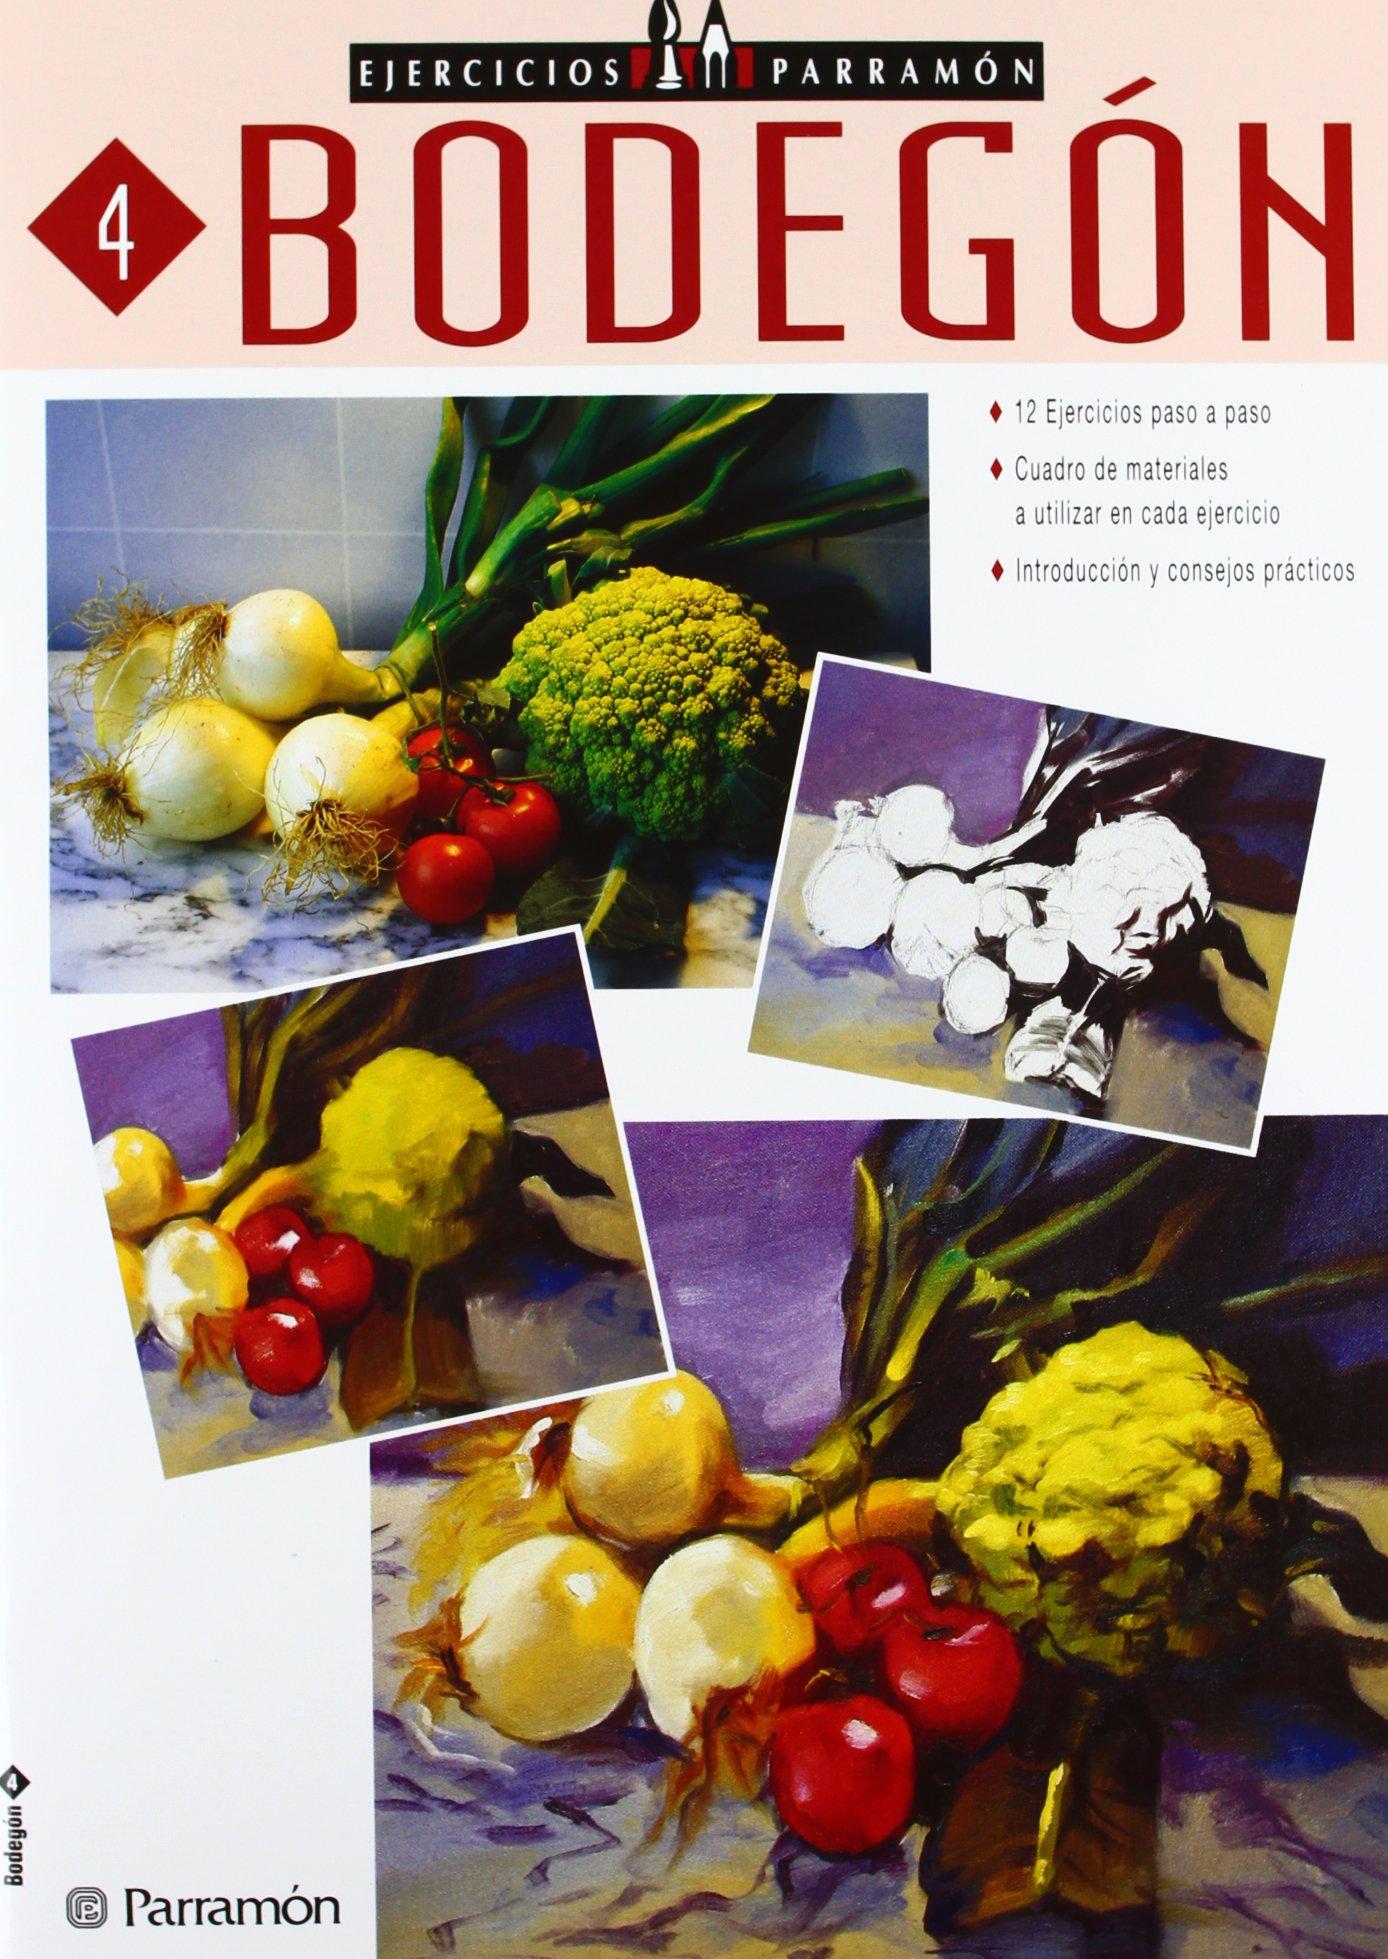 Bodegon (Spanish Edition) ebook